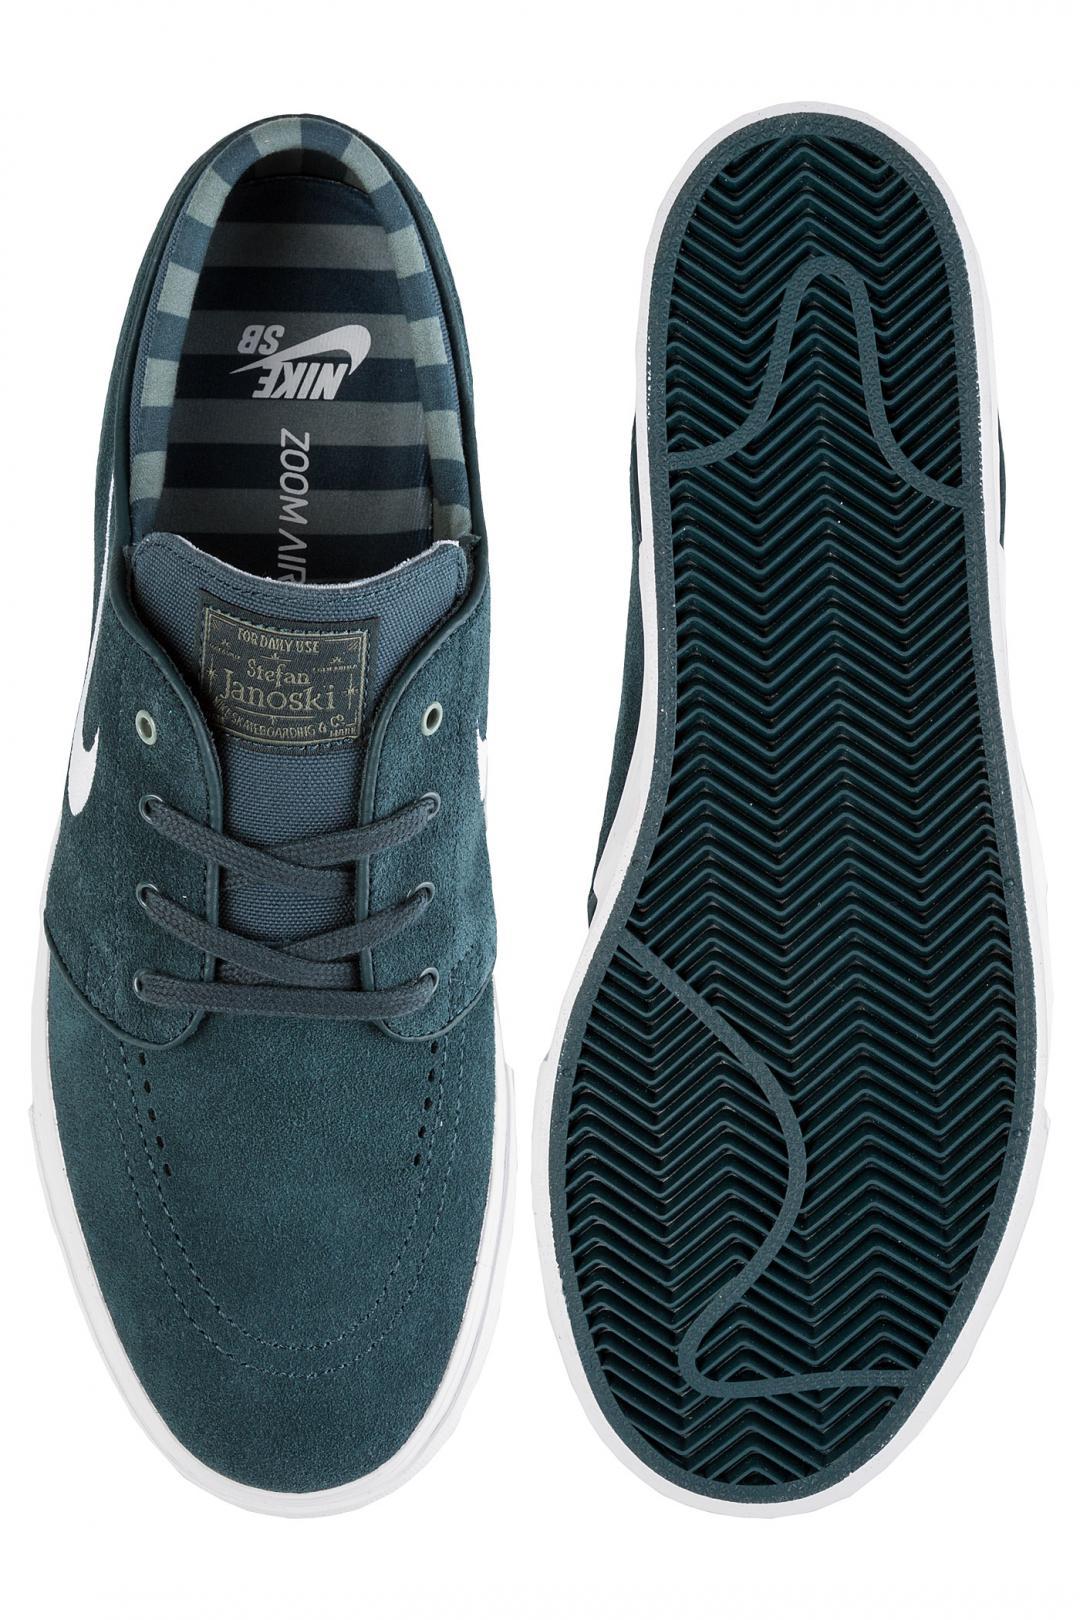 Uomo Nike SB Zoom Stefan Janoski deep jungle white clay green whi | Scarpe da skate